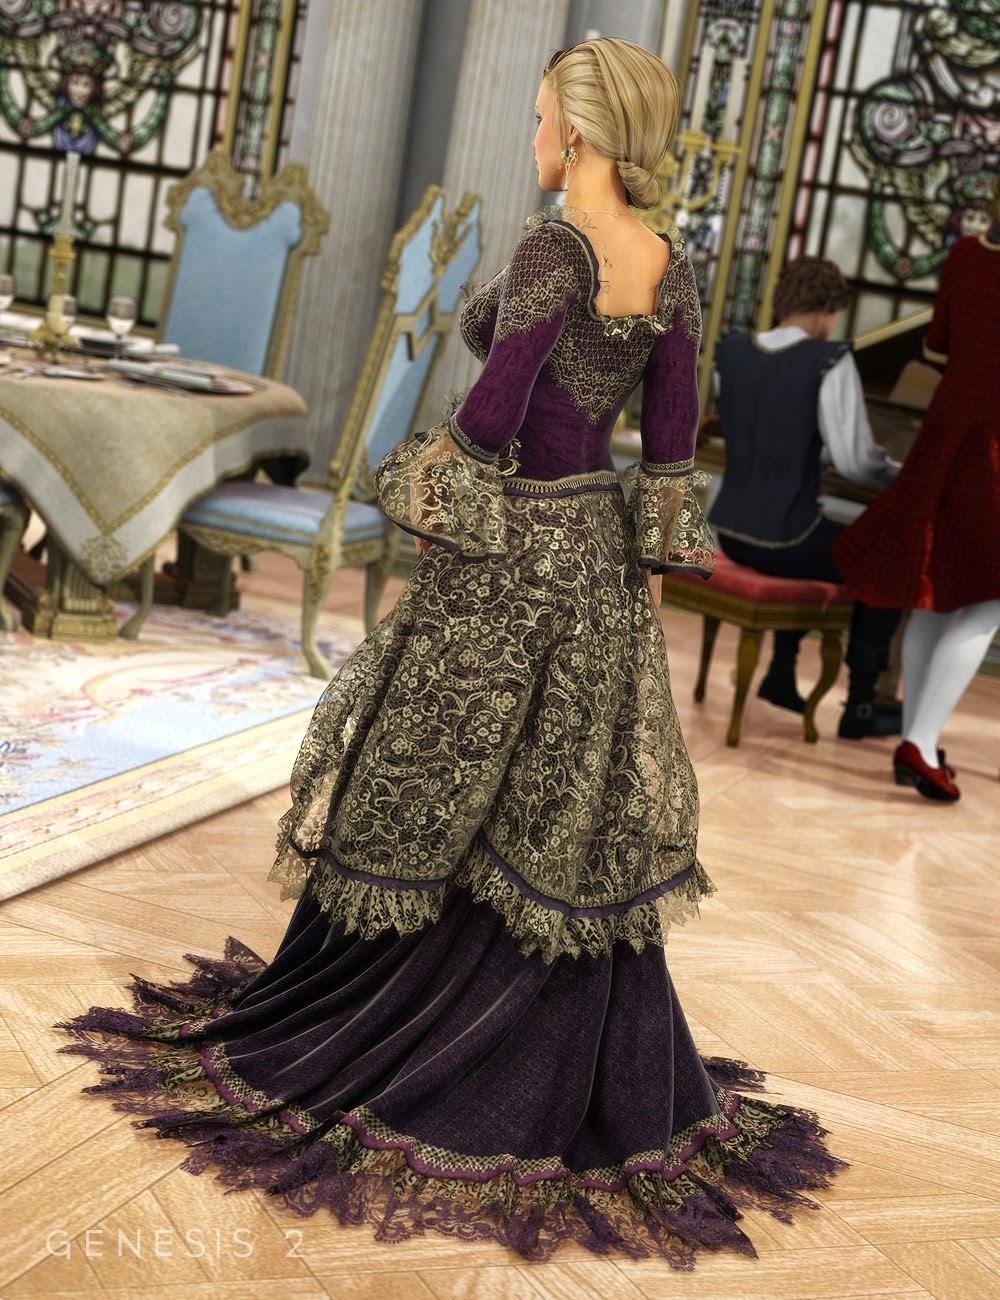 Robe de bal Grande pour Genesis 2 Femme